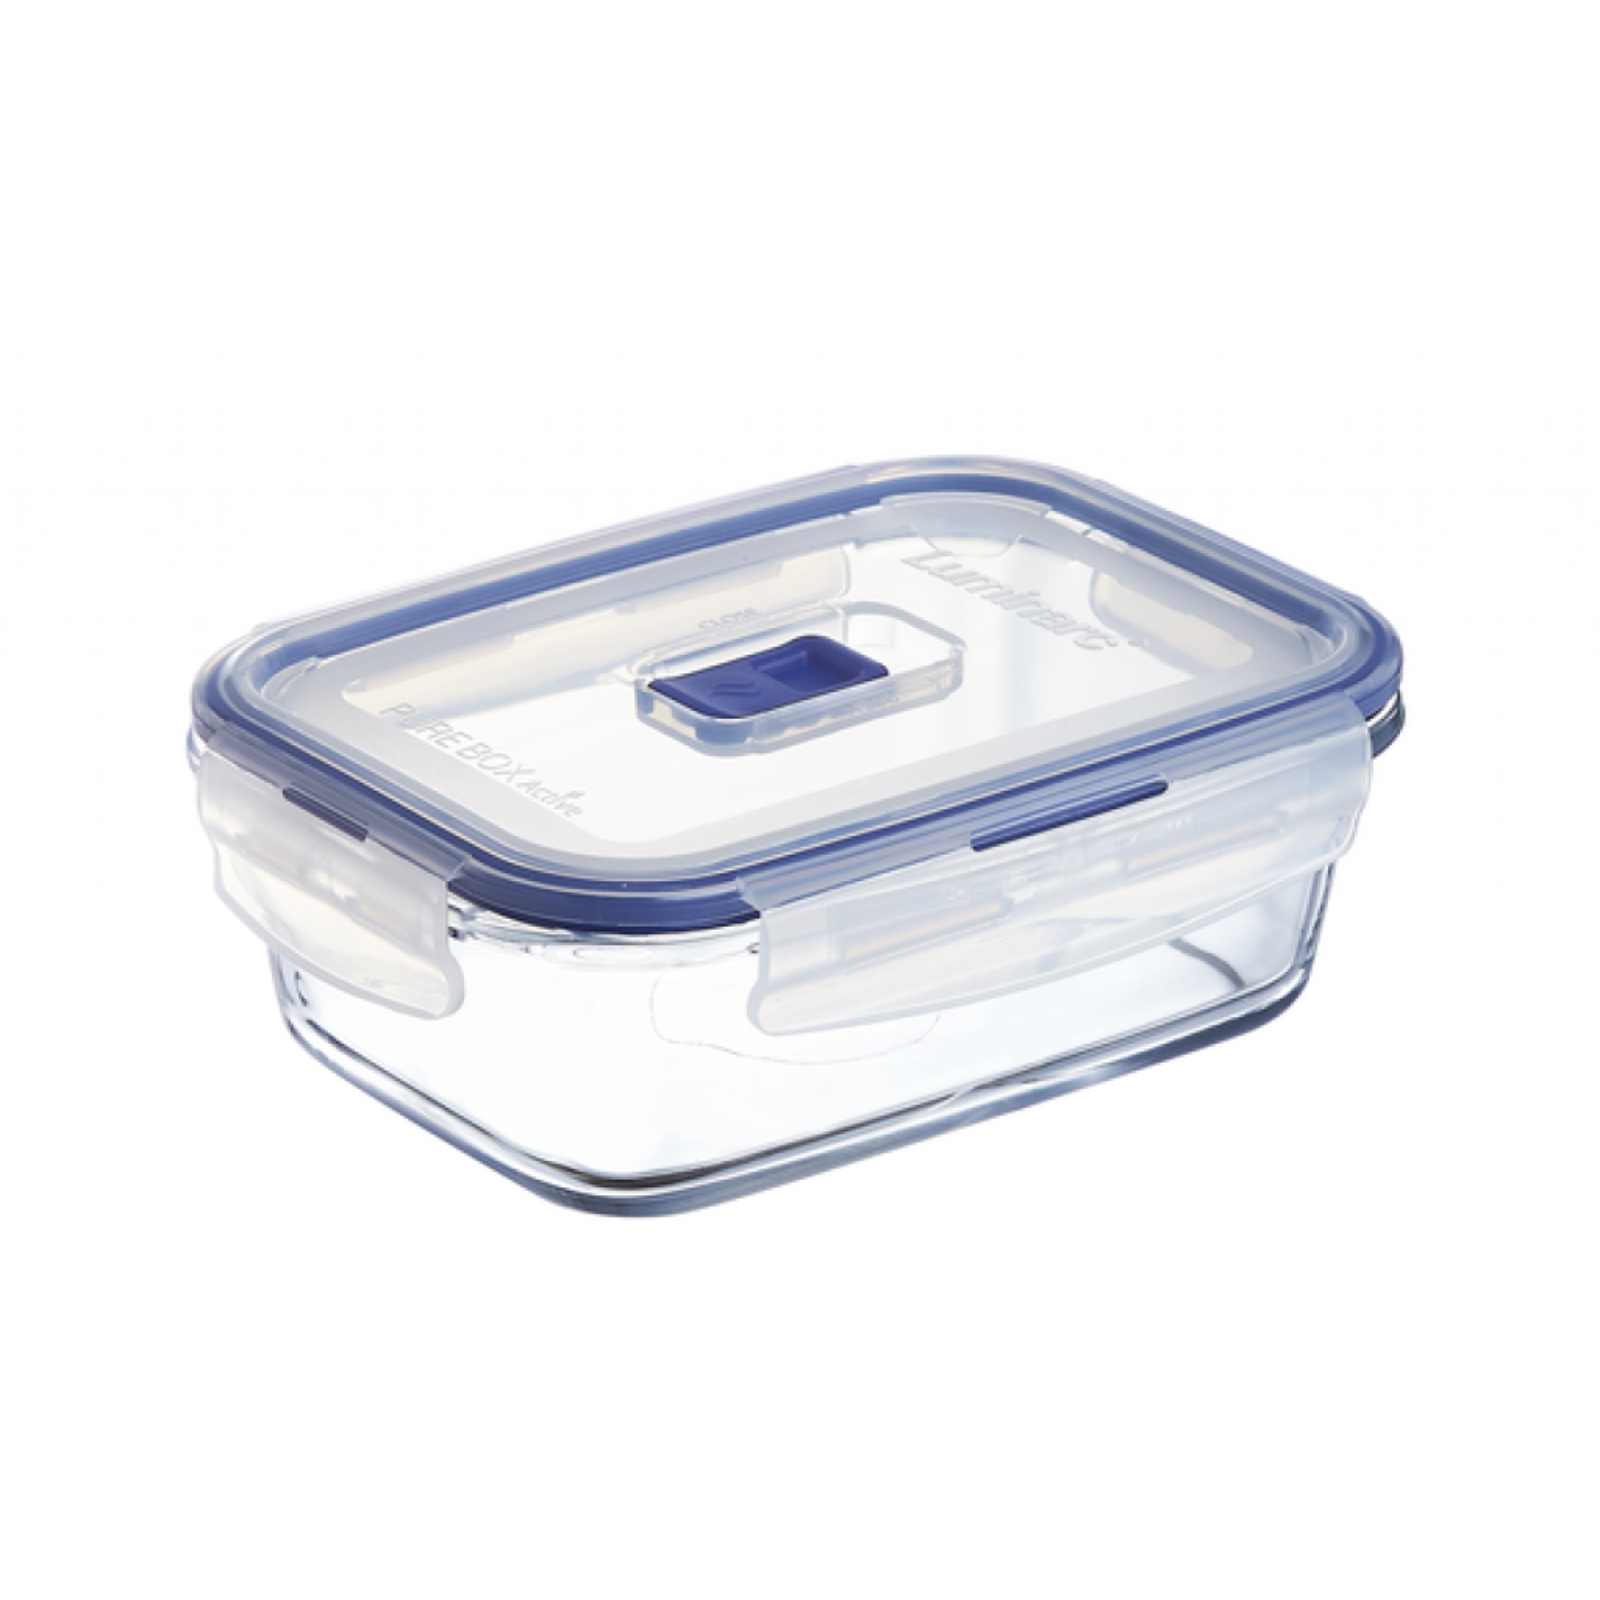 Пищевой контейнер Luminarc Pure Box Active прямоуг. 820 мл (P3547)